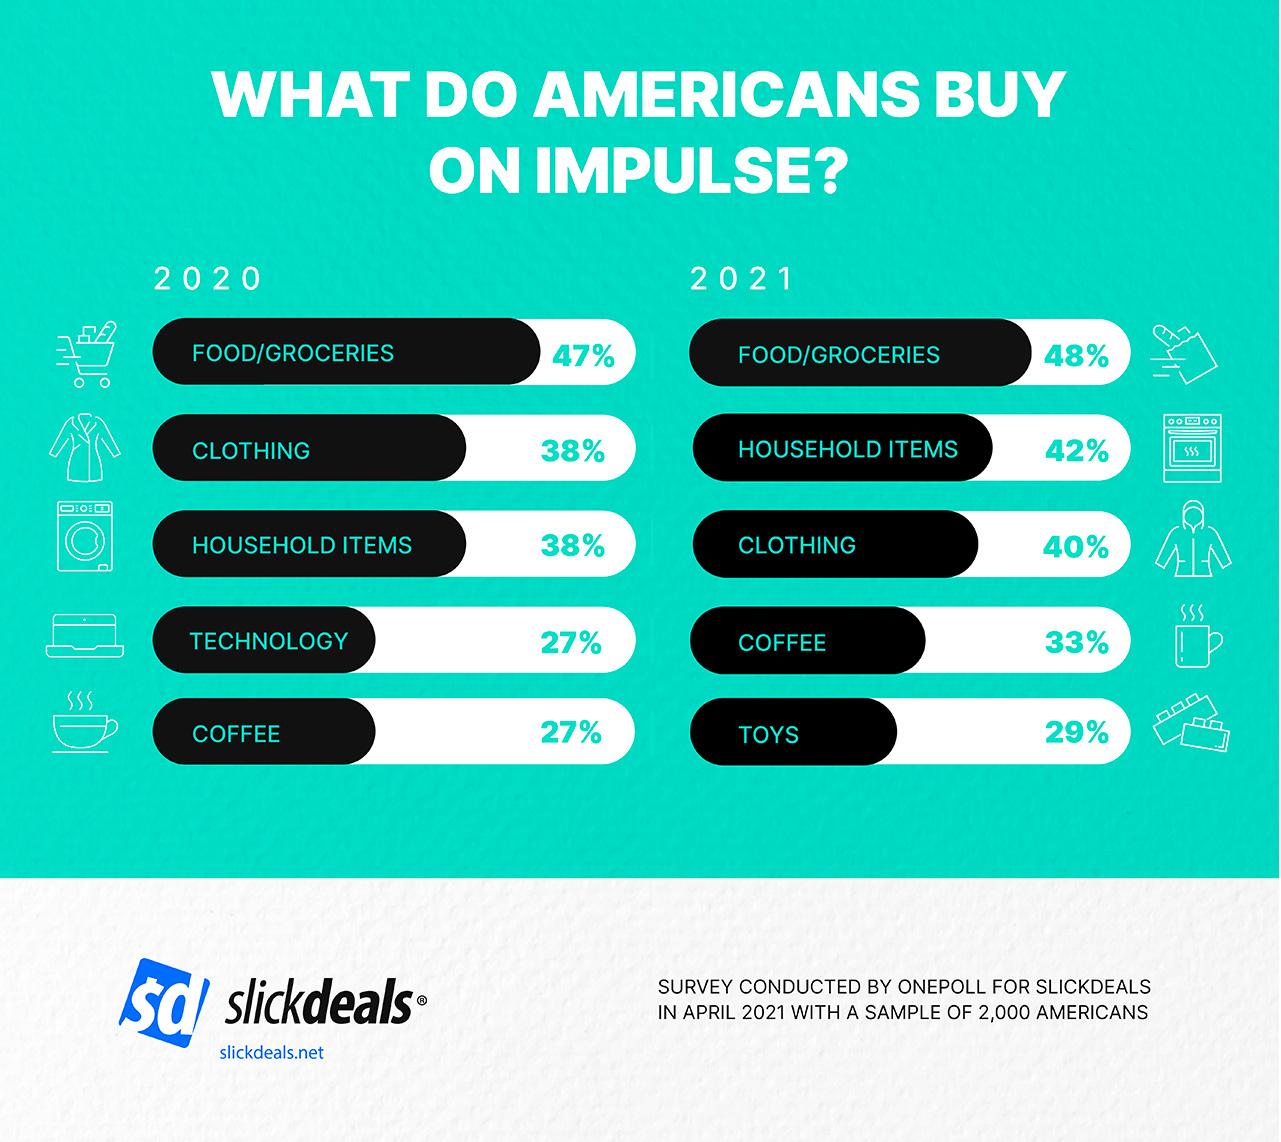 slickdeals impulse spending survey 2021